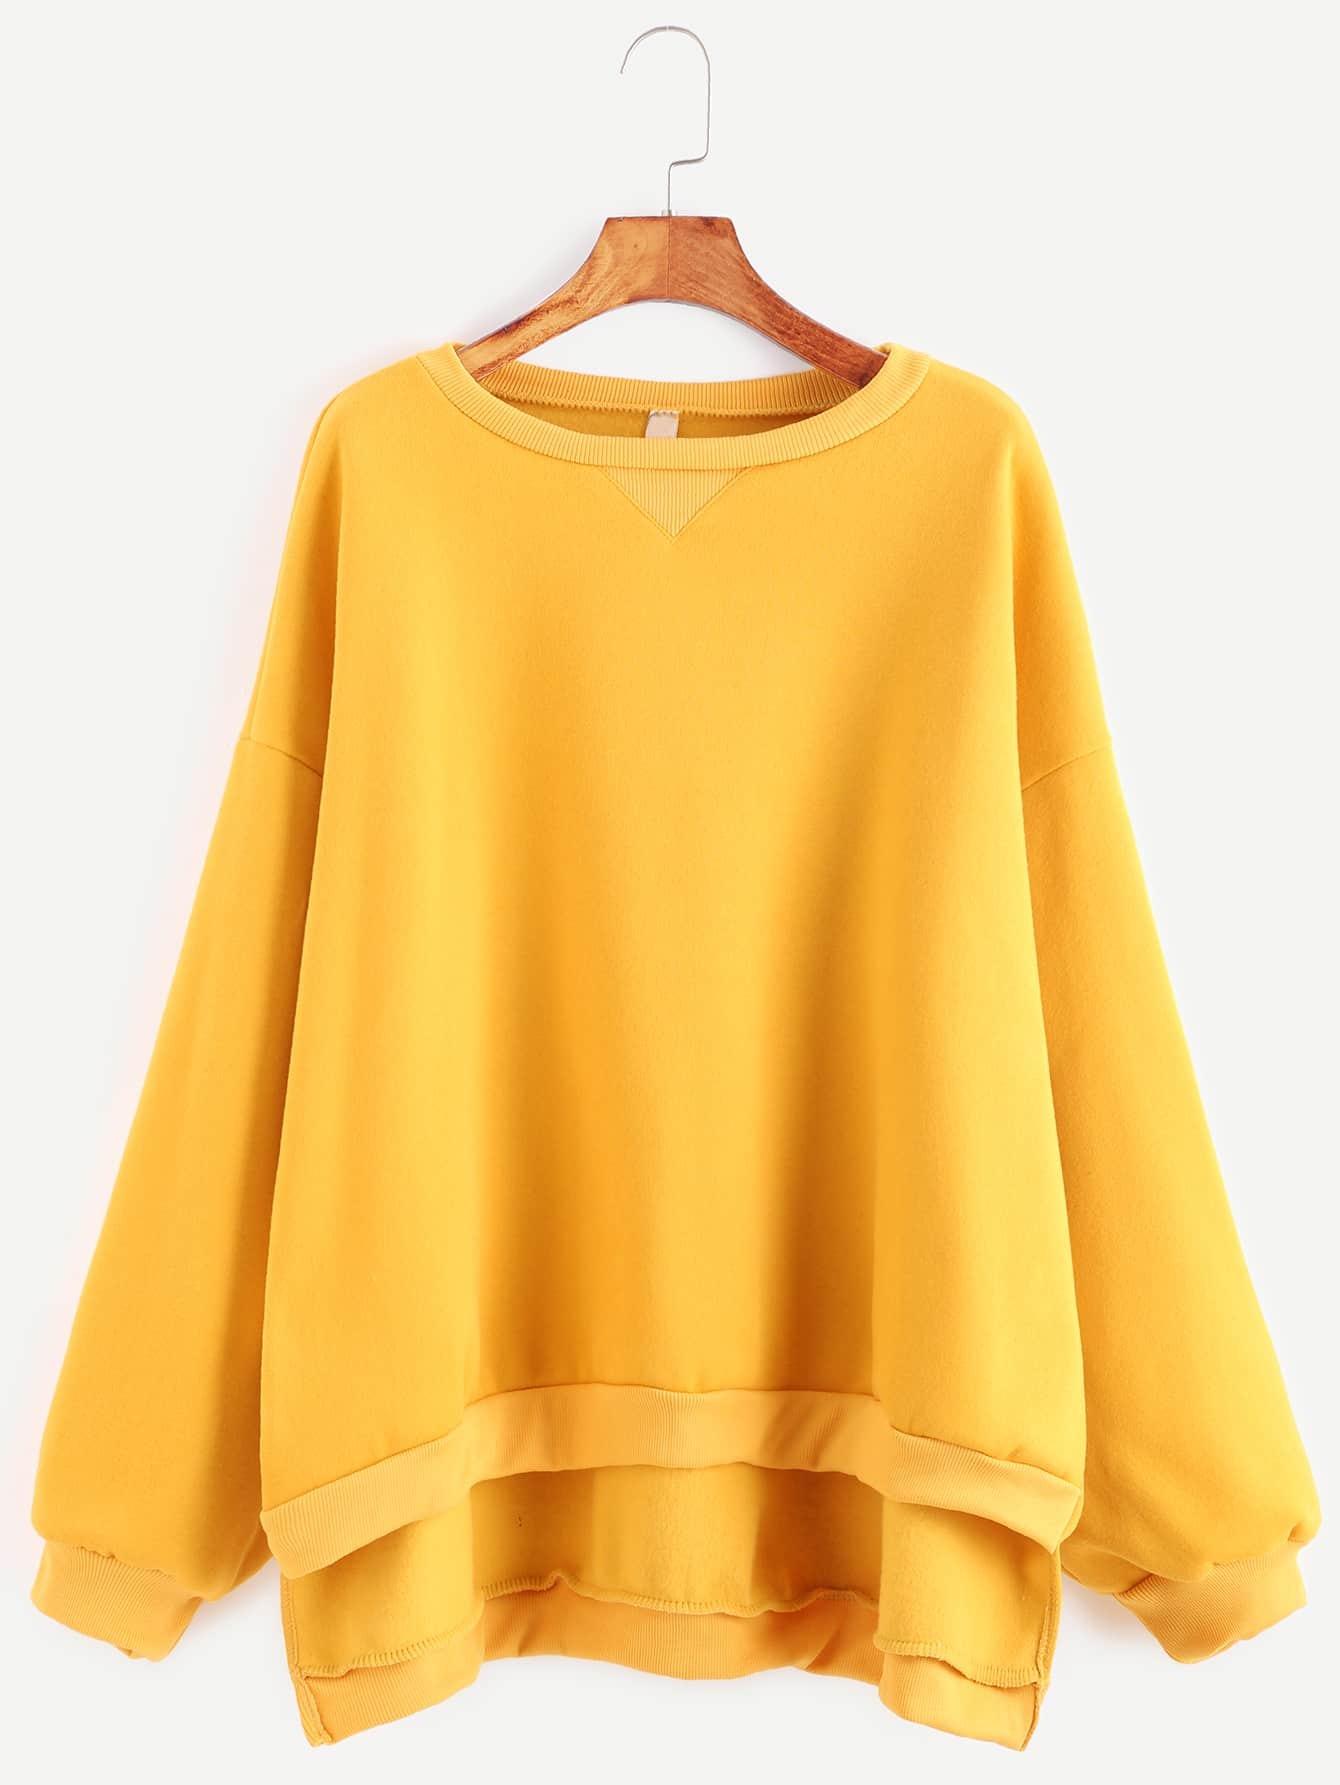 jack-daniels-florida-yellow-sweatshirts-size-petite-nylon